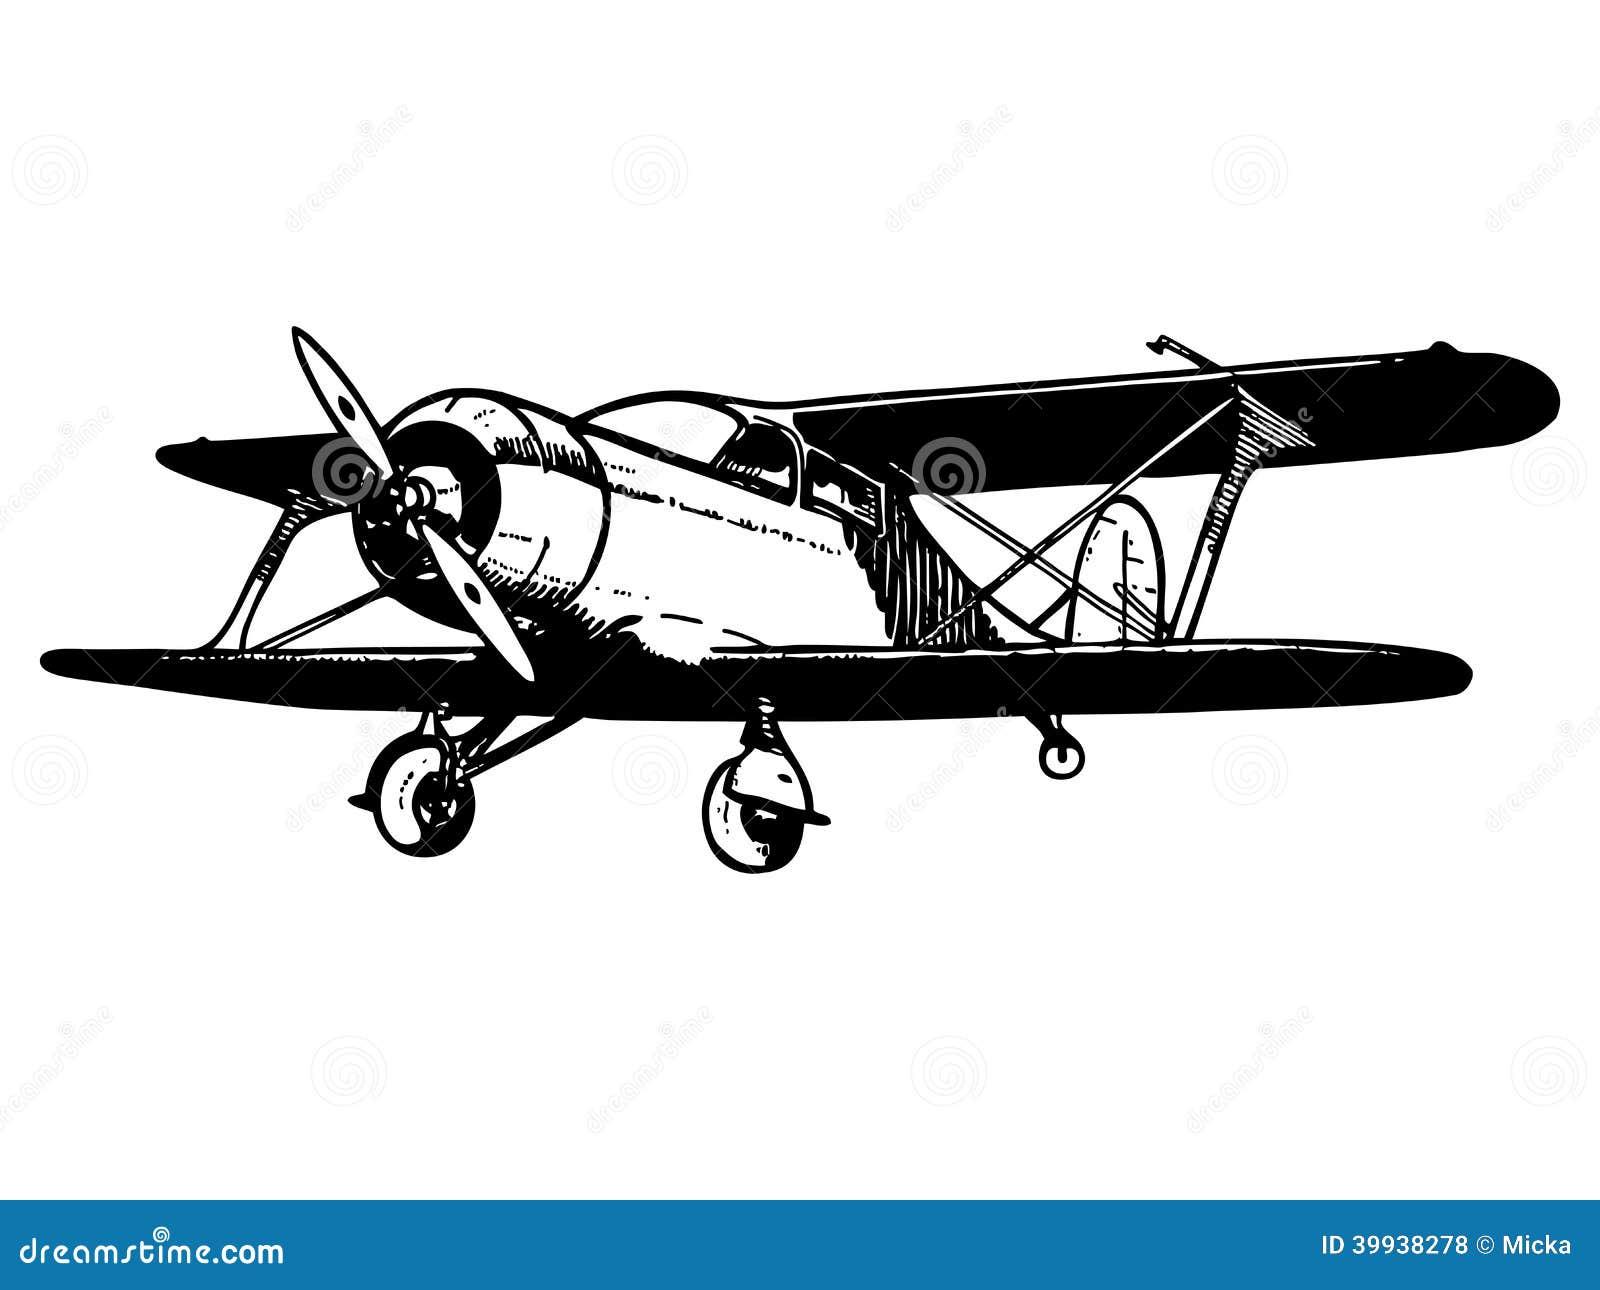 Vintage Biplane Aircraft Stock Vector - Image: 39938278